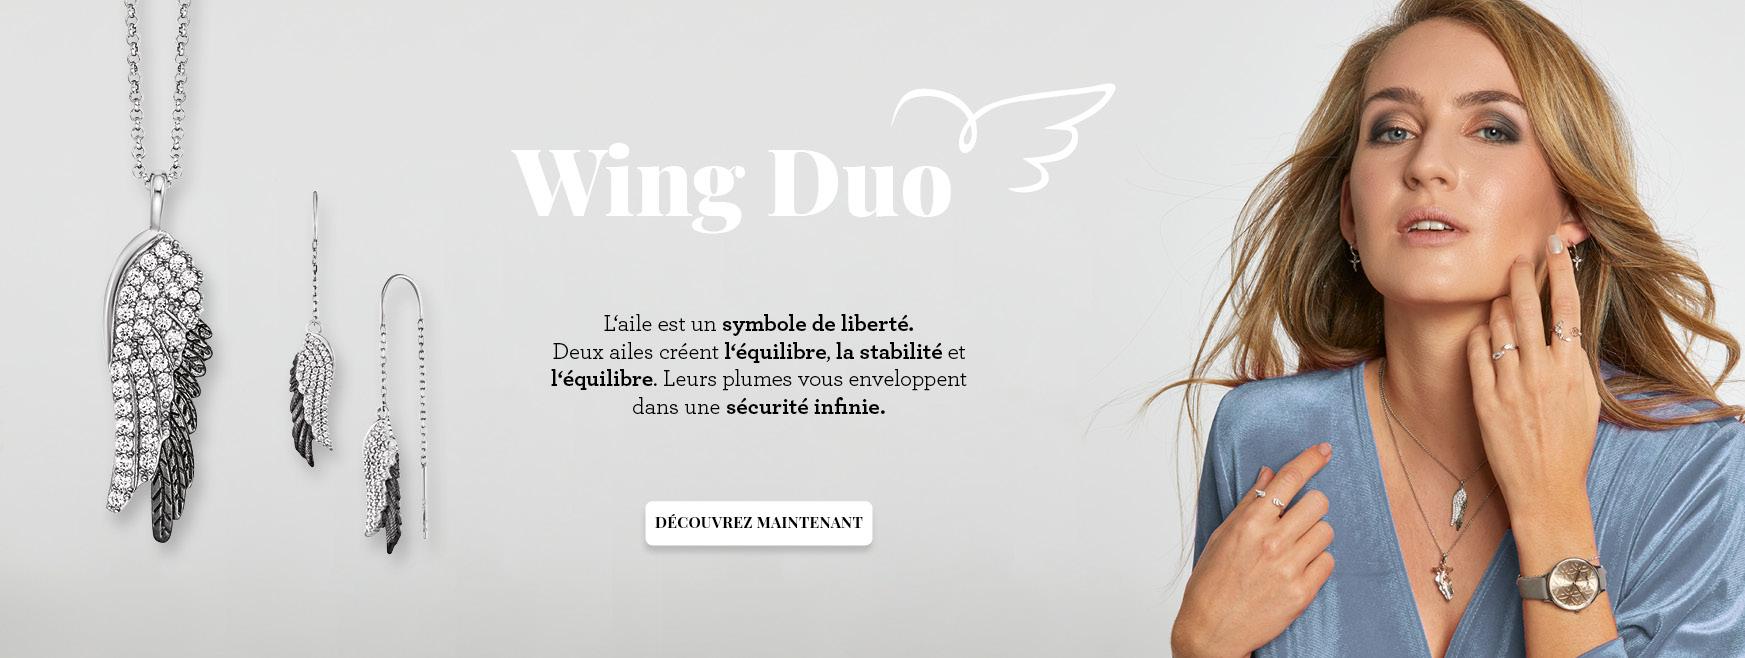 Wingduo